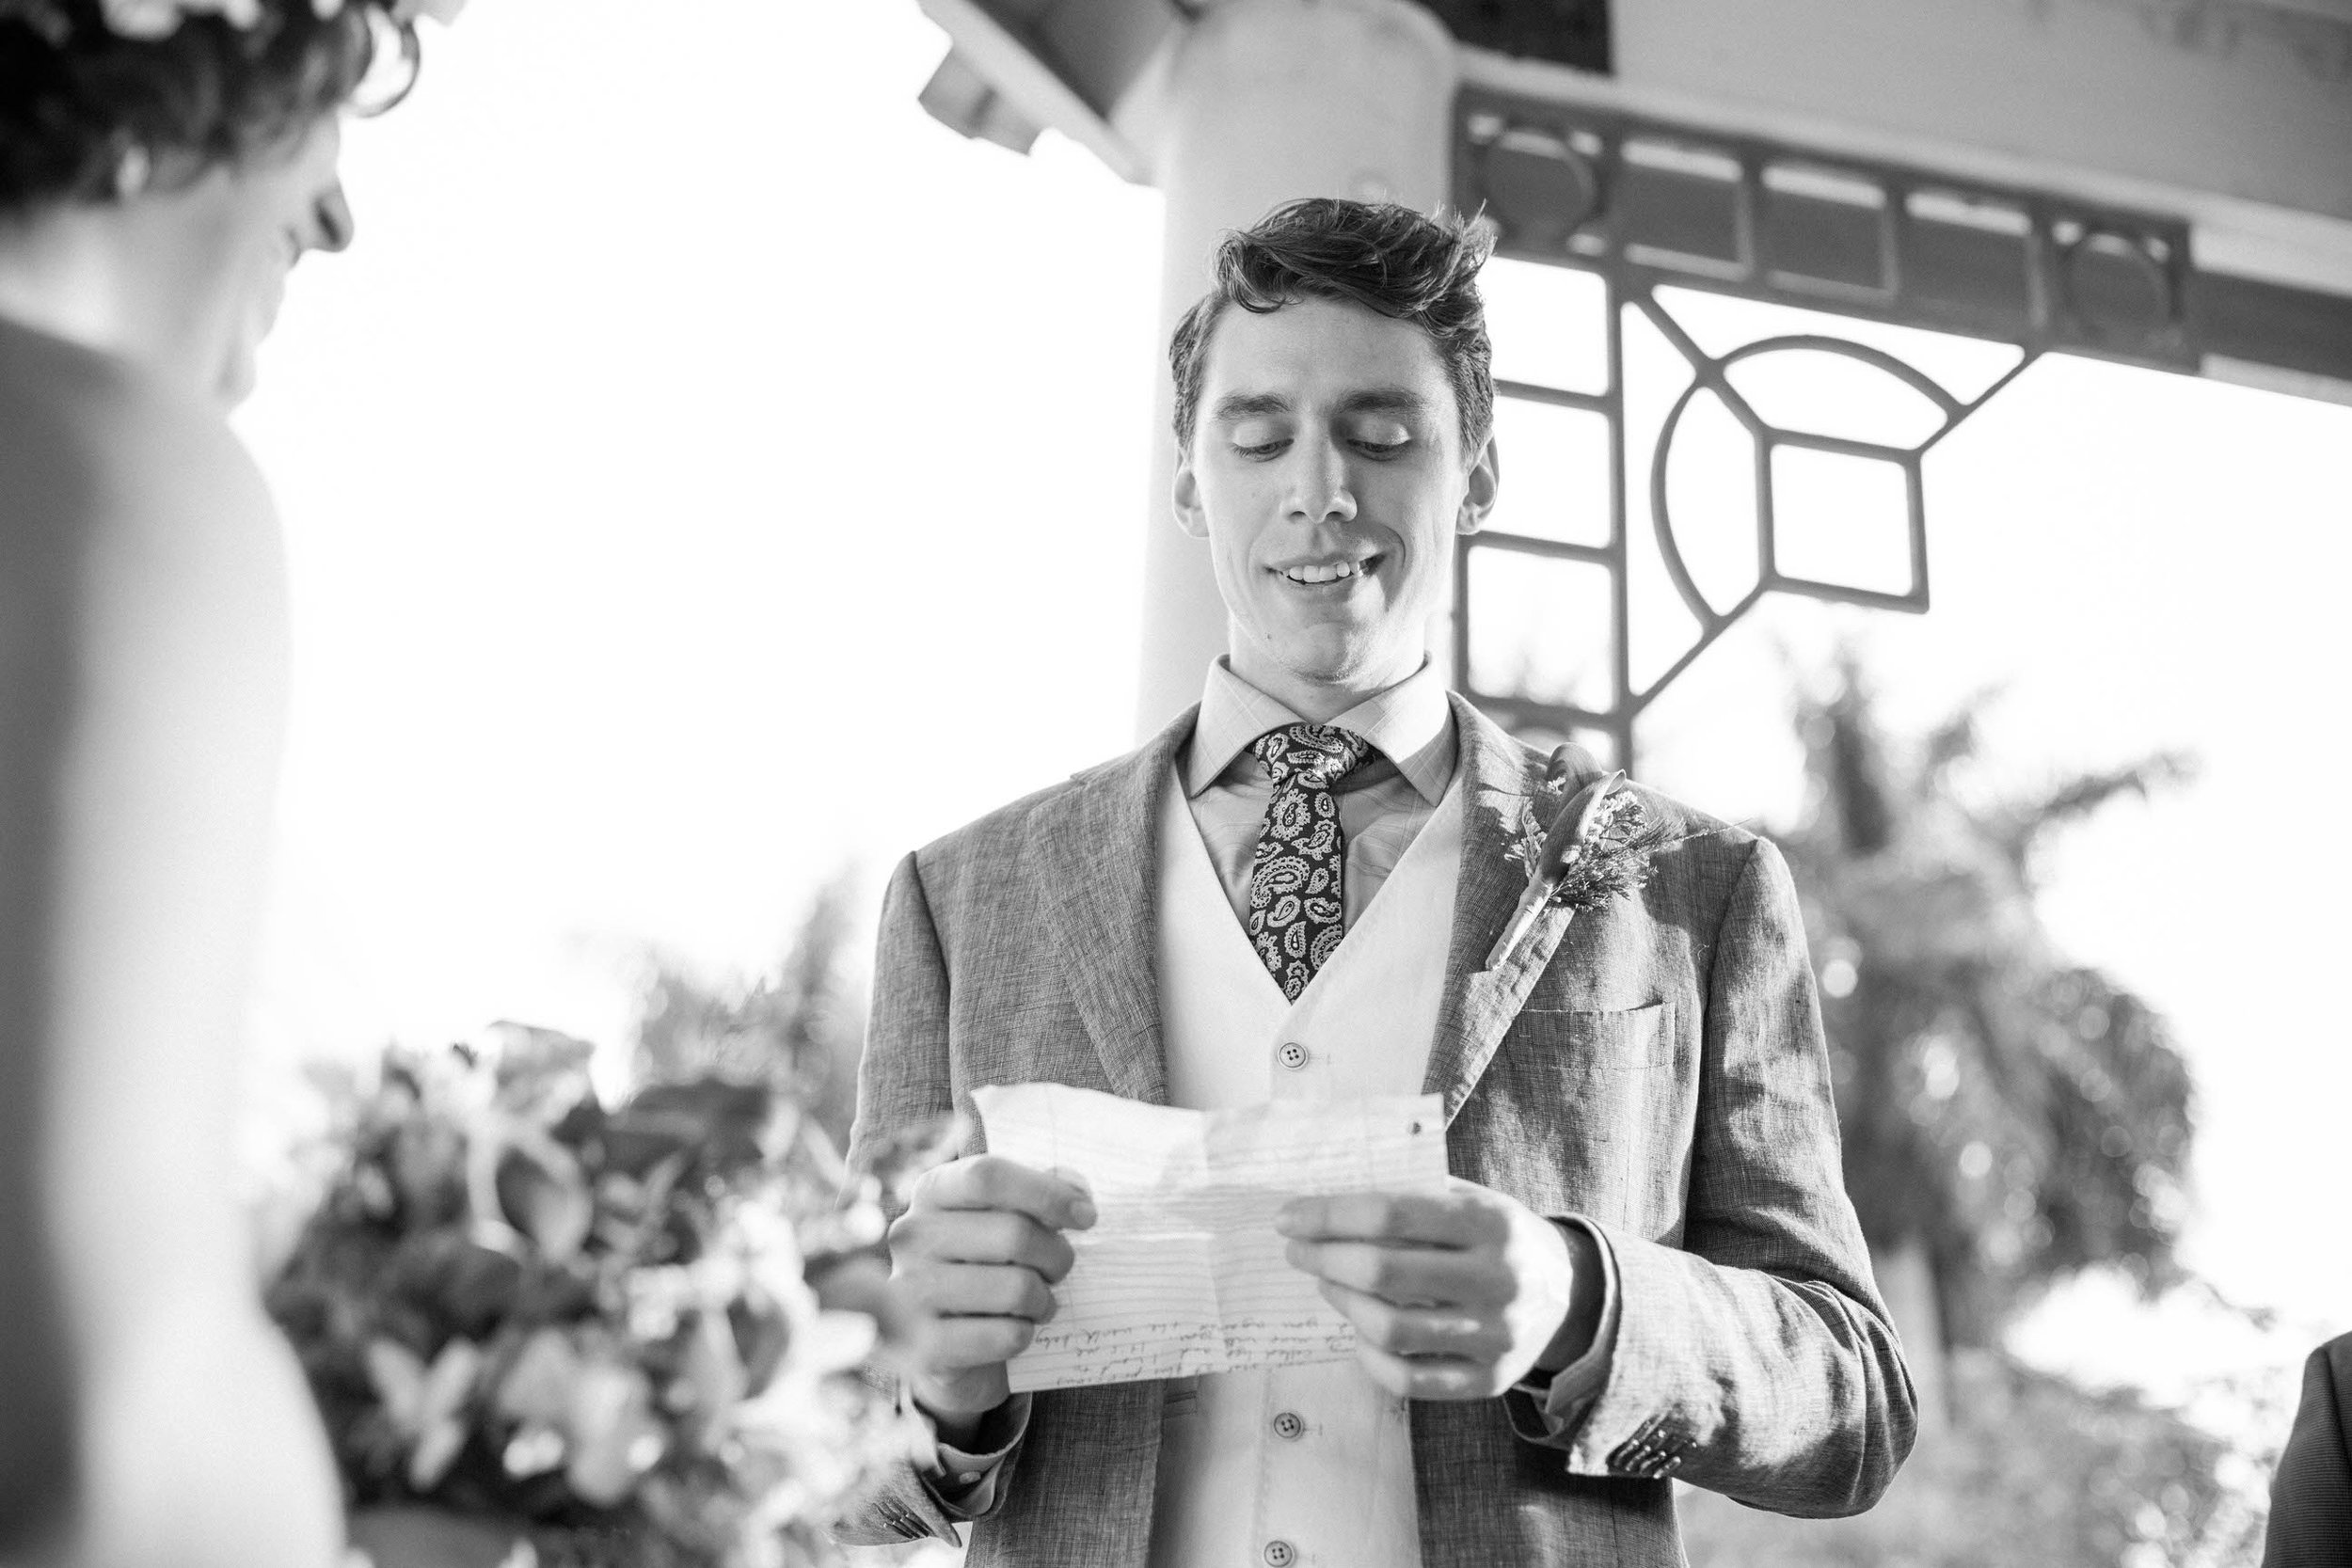 veterans-park-wedding-ceremony-pop-up-black-and-white-vows.jpg